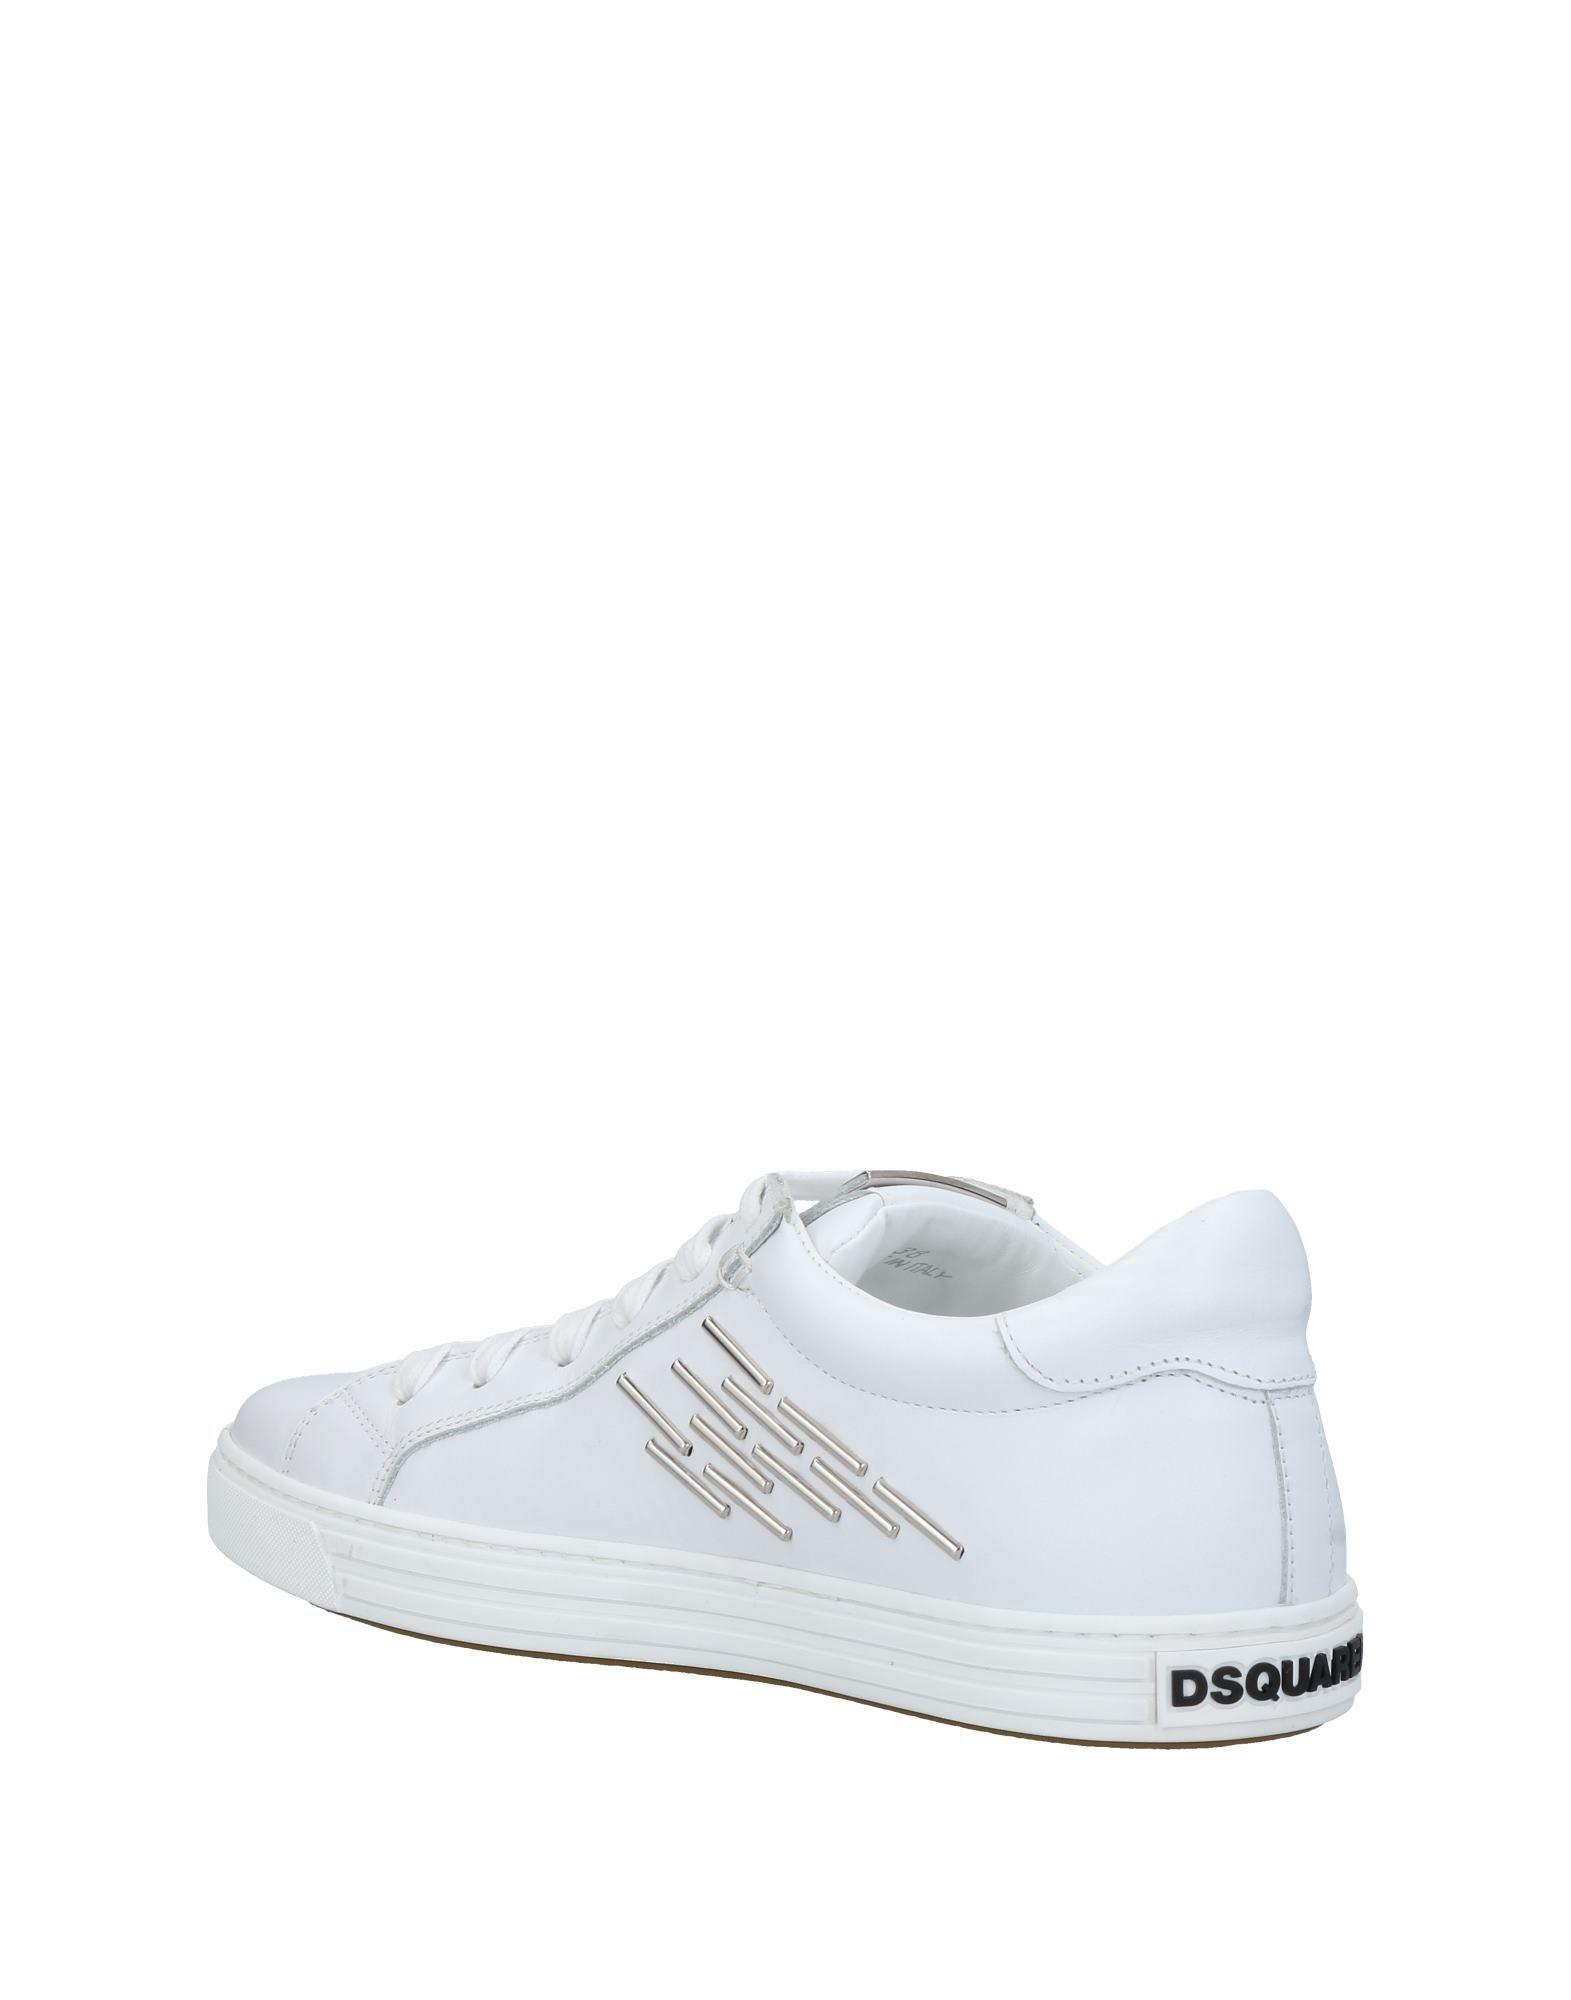 Rabatt Dsquared2 Schuhe Dsquared2 Rabatt Sneakers Damen  11441223XT 68b94b